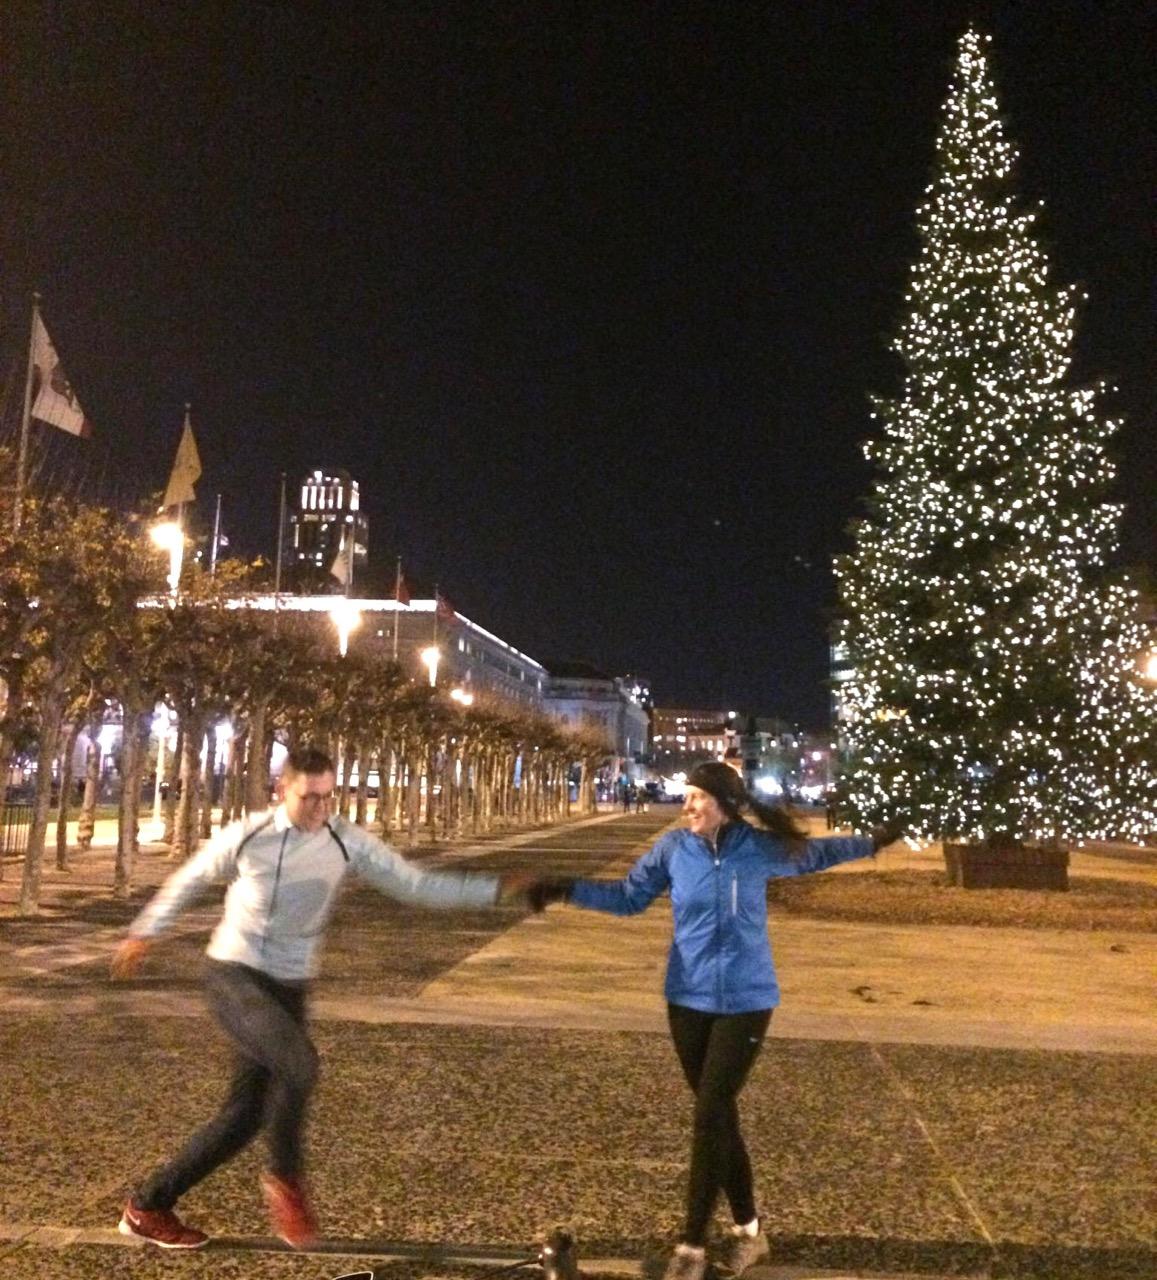 Drew and lauren dancing at city hall